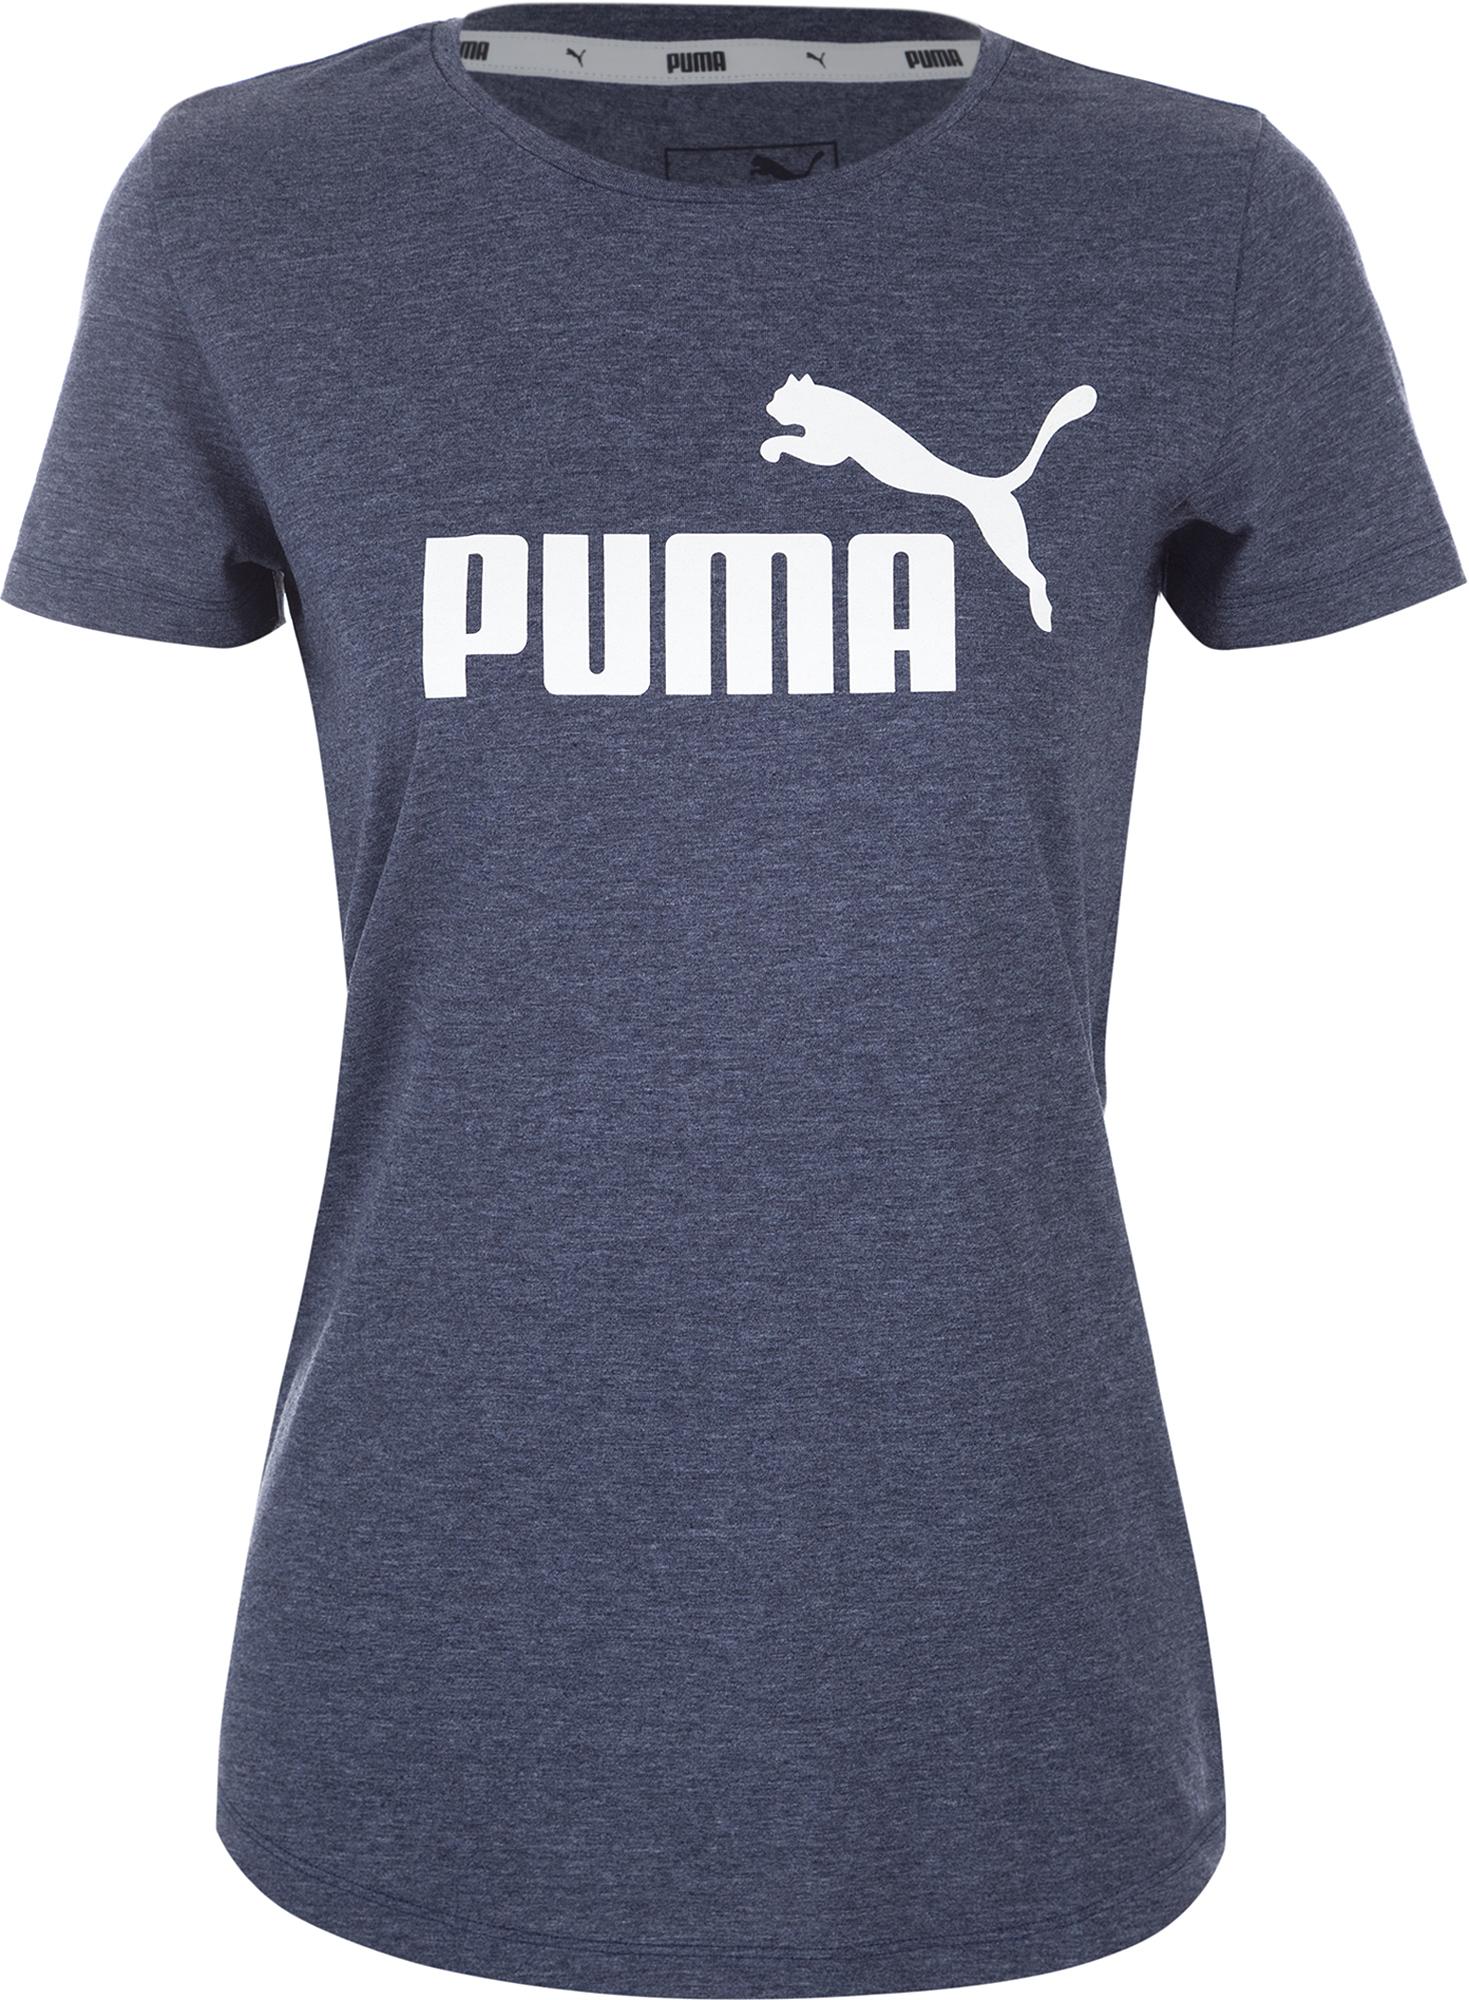 Puma Футболка женская Puma Ess+ Logo Heather Tee, размер 46-48 футболка женская puma evo tee цвет персиковый 57511231 размер m 44 46